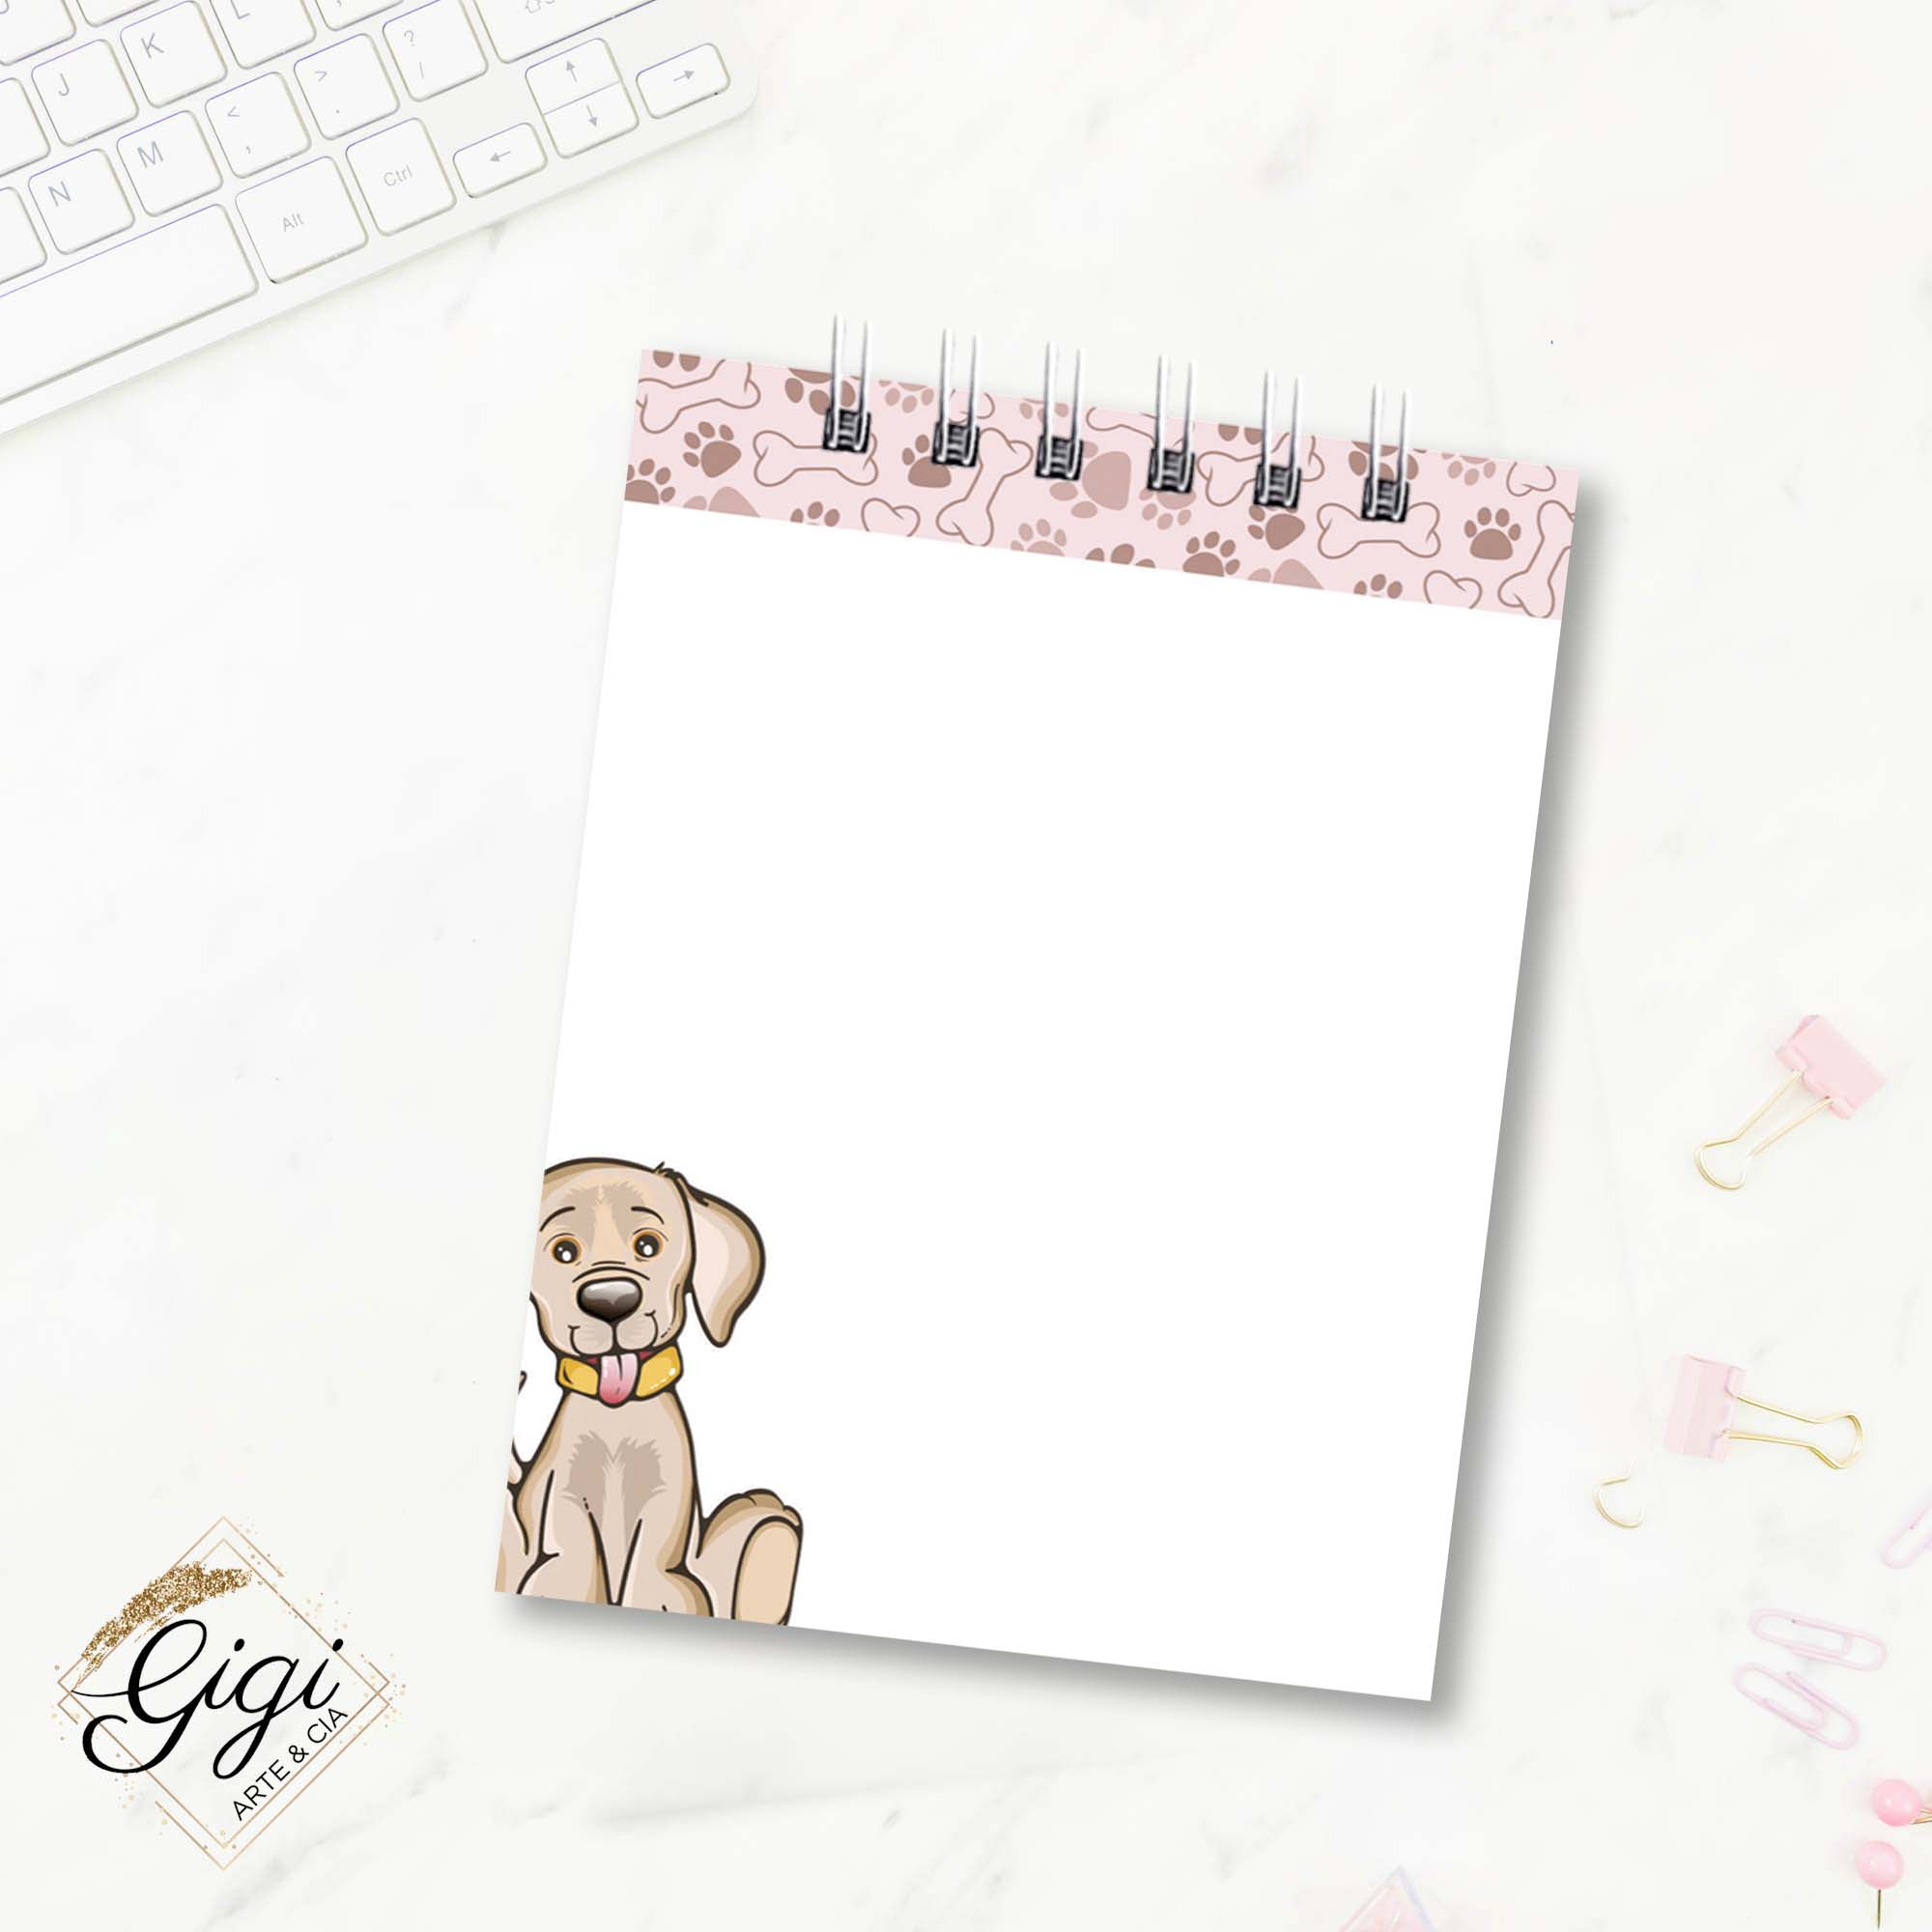 Bloco de Anotações - Pets  - Petit Palais de Papier